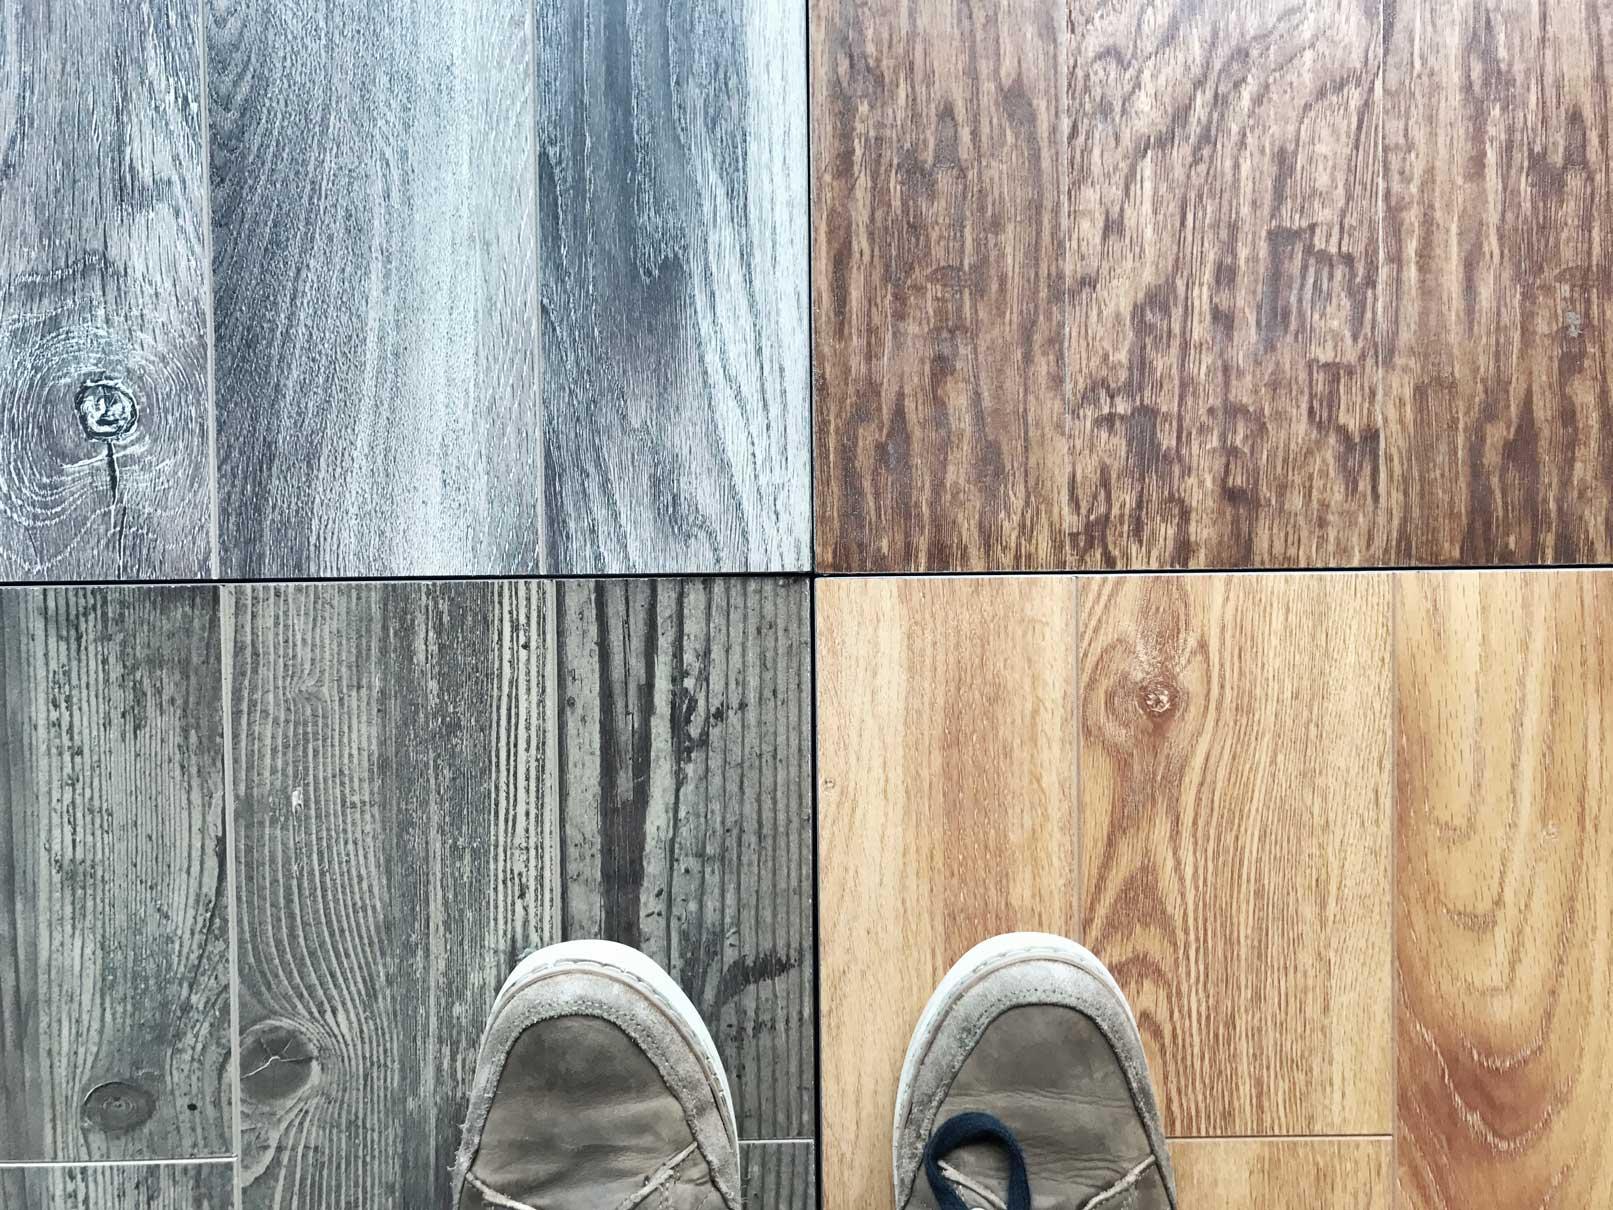 Why Laminate Flooring is 10x Better than Hardwood! & Why Laminate Flooring is 10x Better than Hardwood! \u2014 Divine Hardwood ...